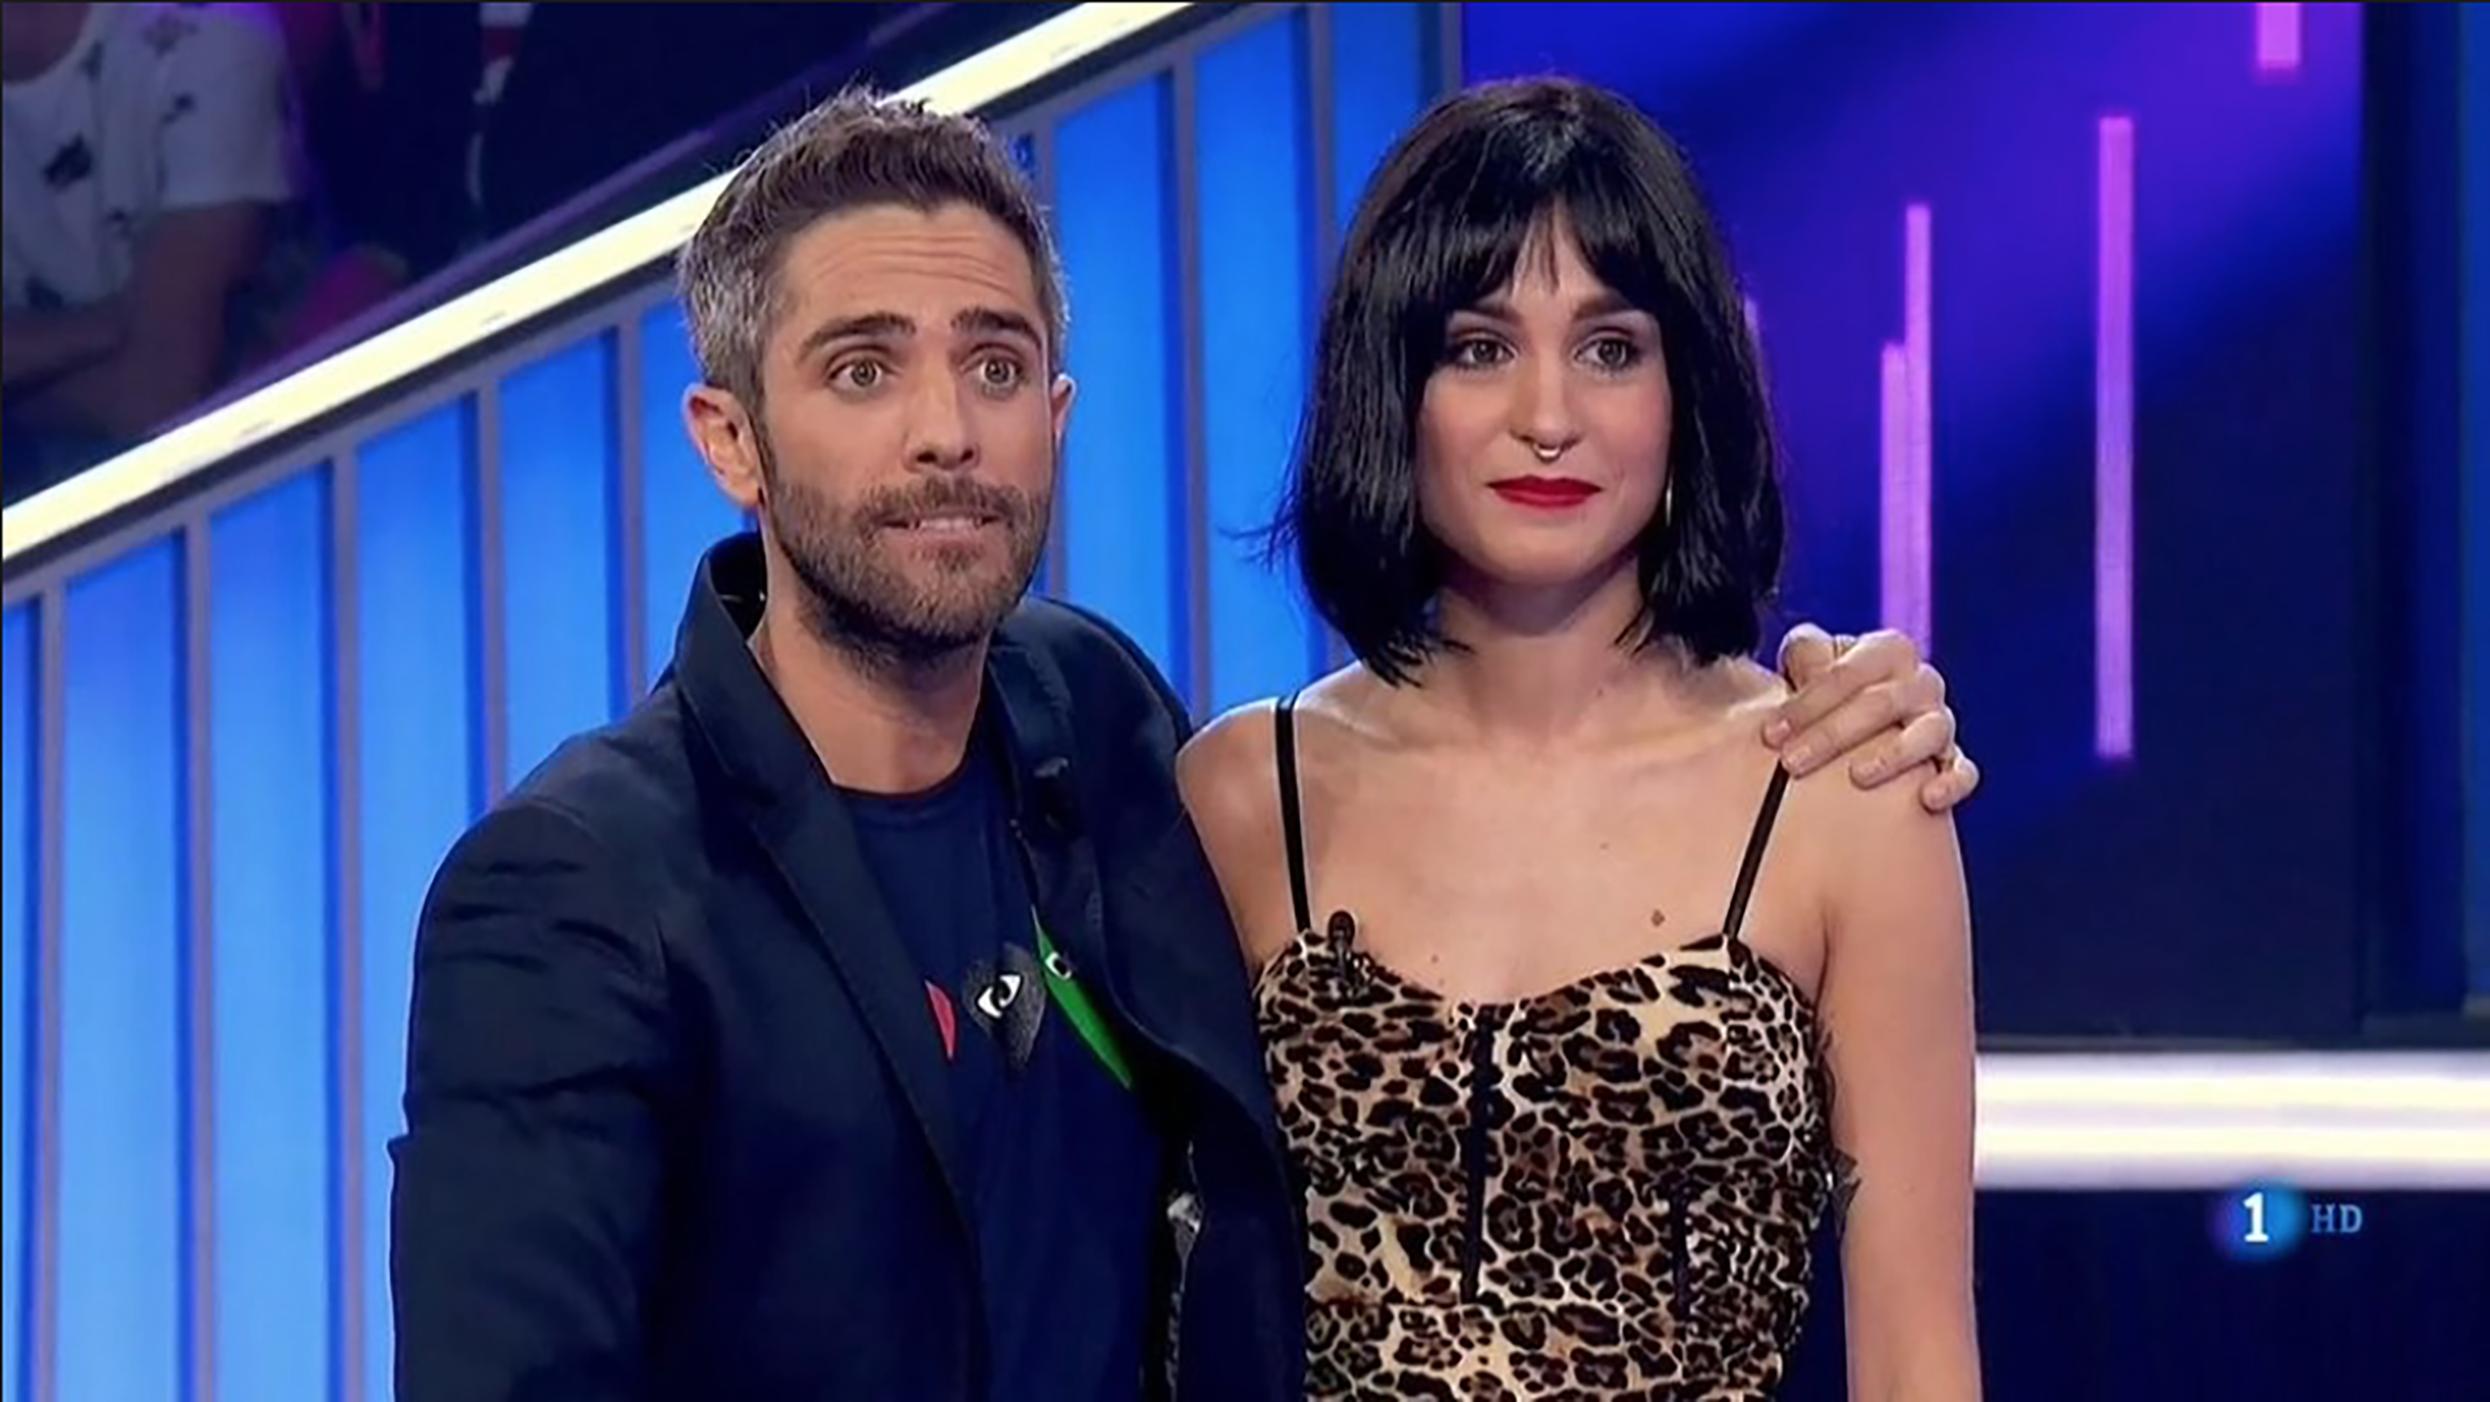 Roberto Leal seguirá en 'OT' a pesar de presentar 'Pasapalabra'